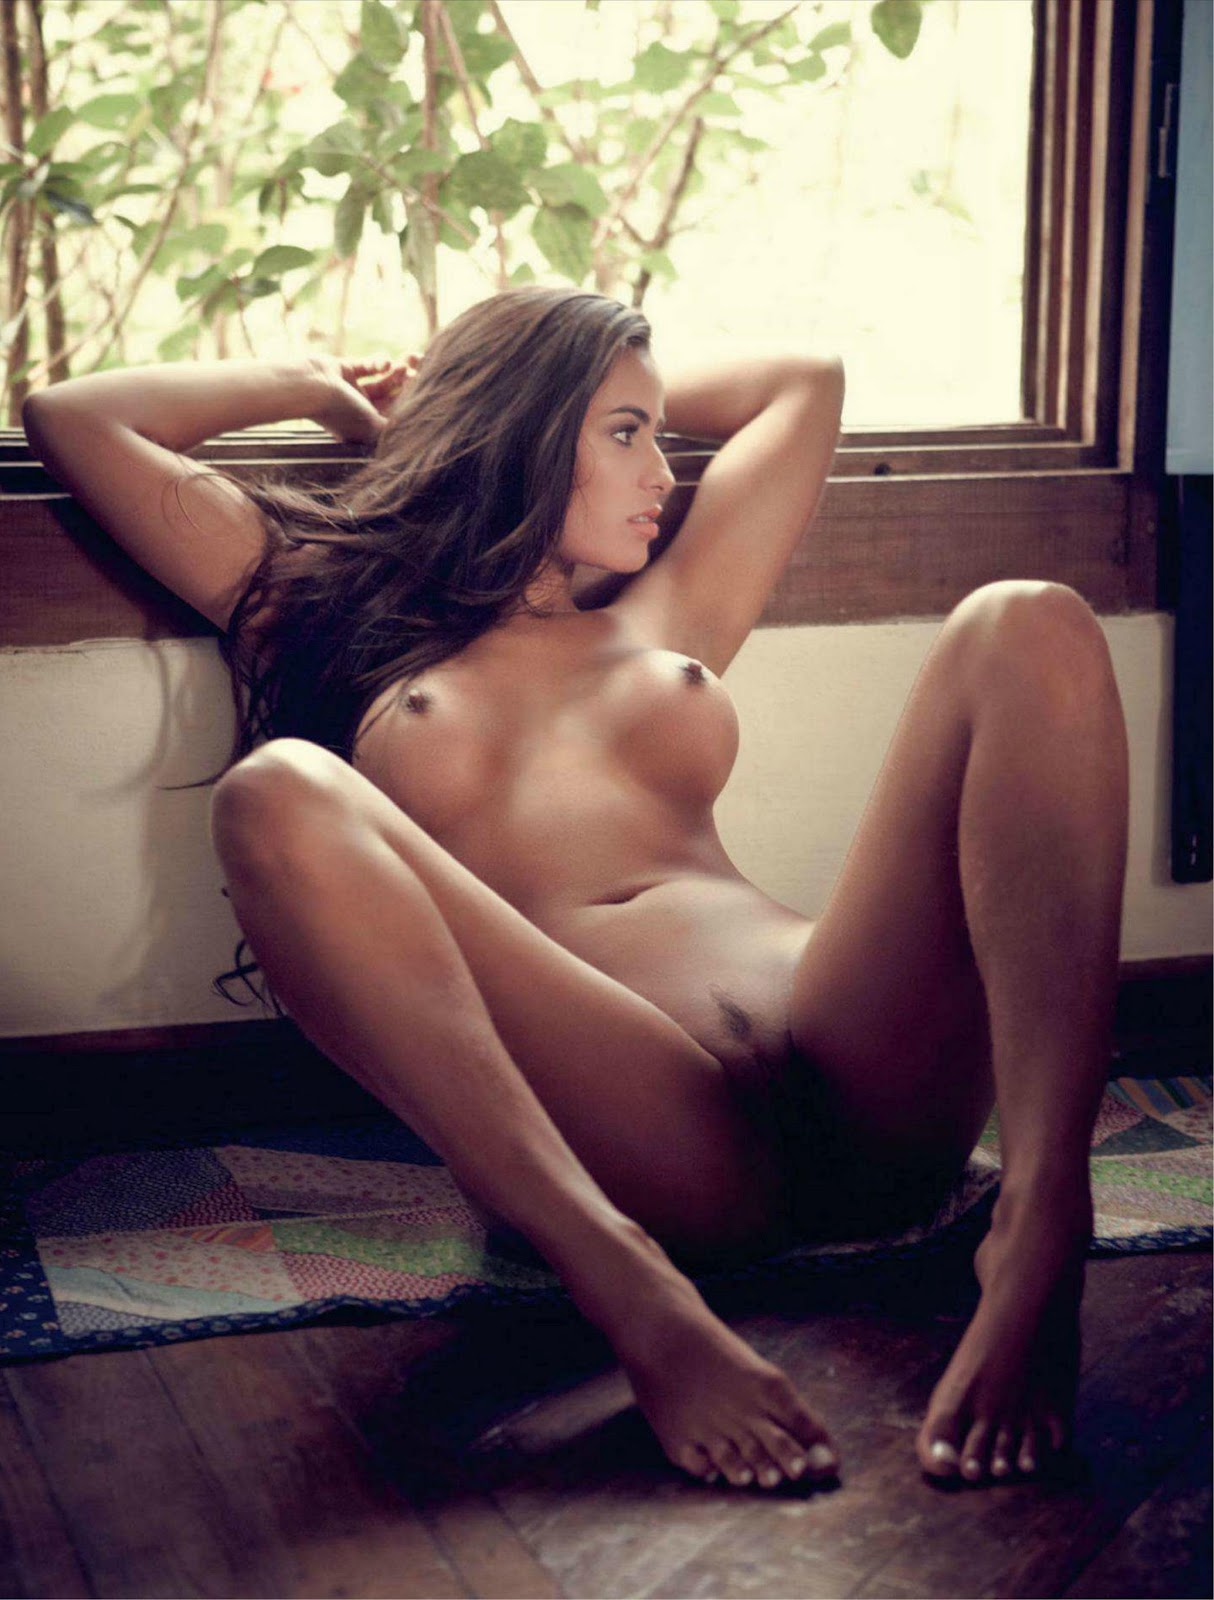 Sorry, vivi naked amusing